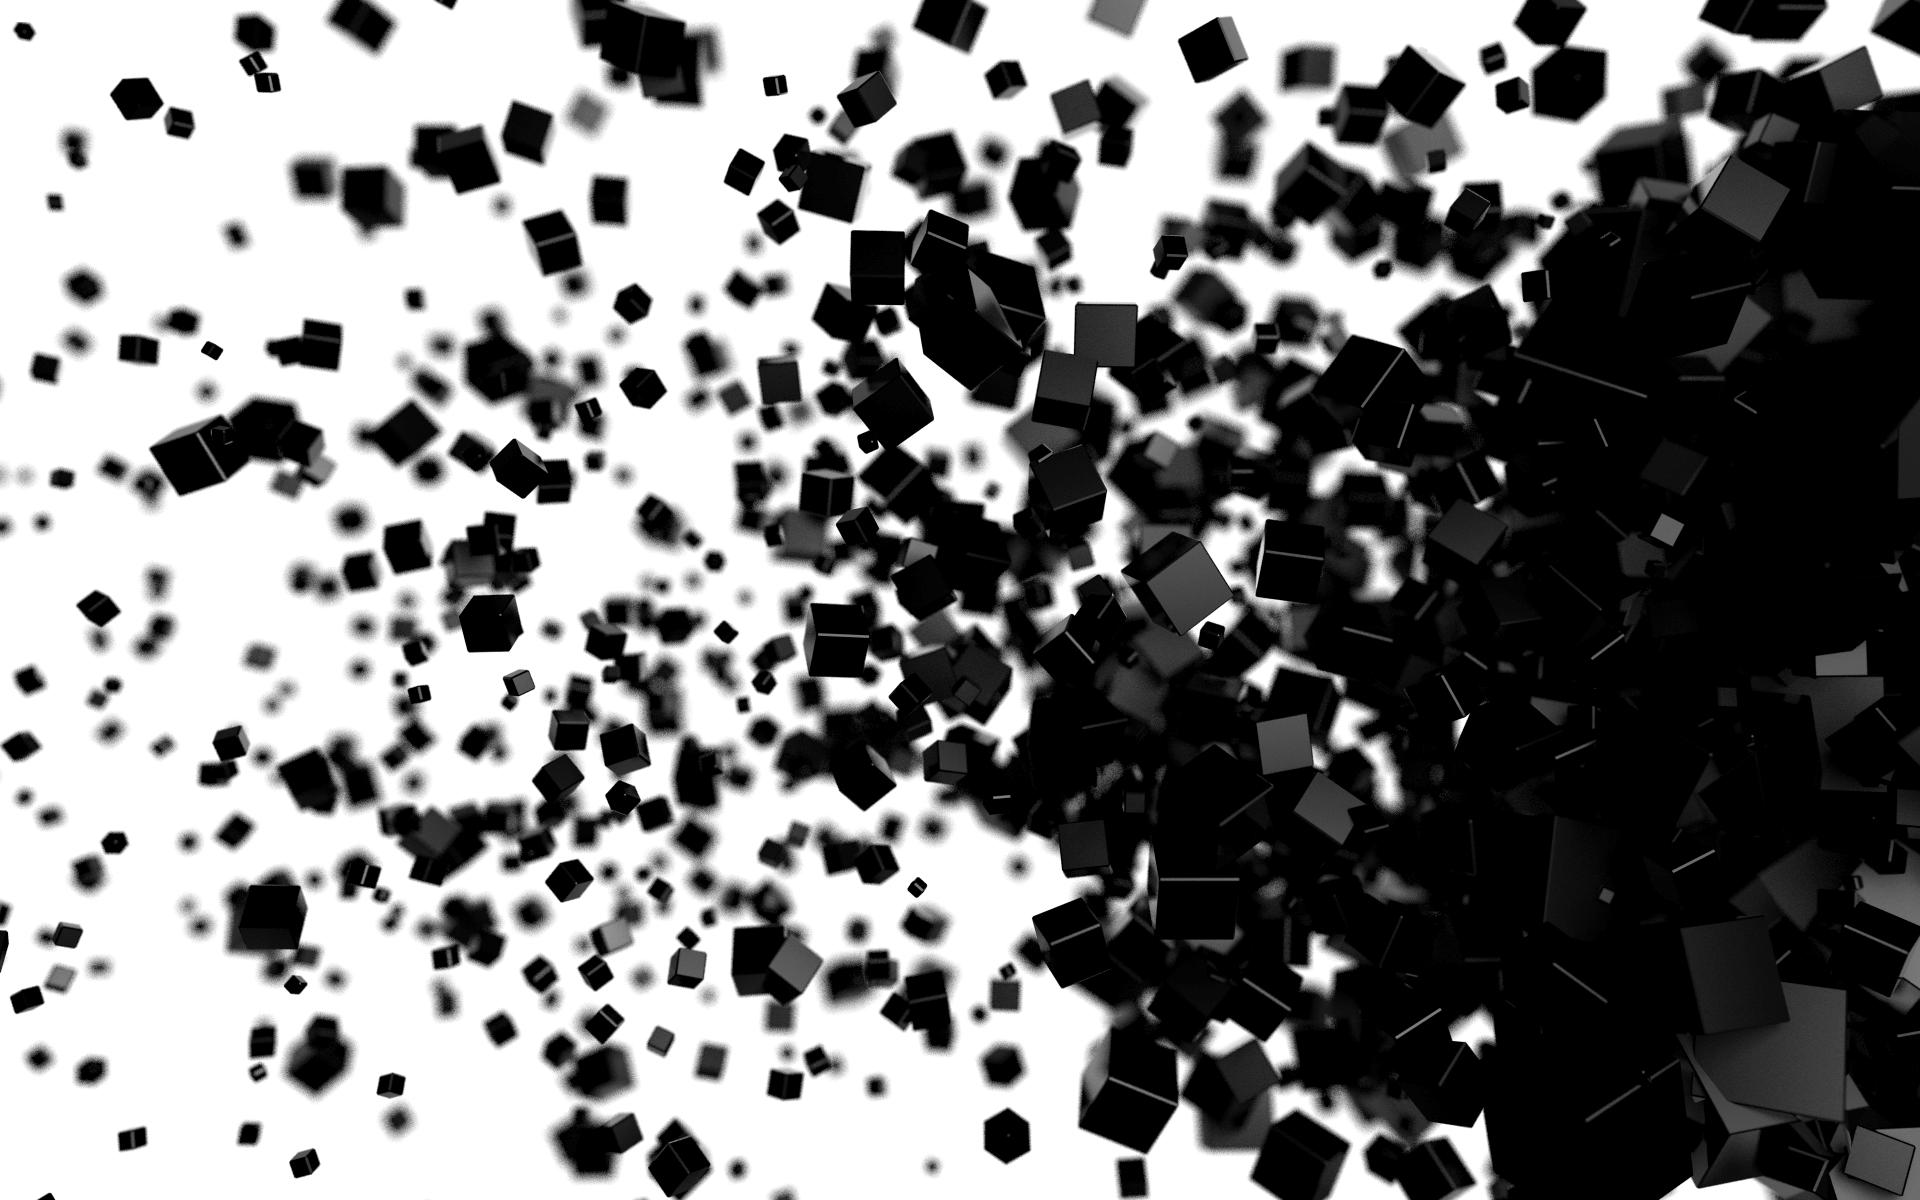 Papel De Parede Abstrato Fundo Branco 3d Cgi Cubo Preto